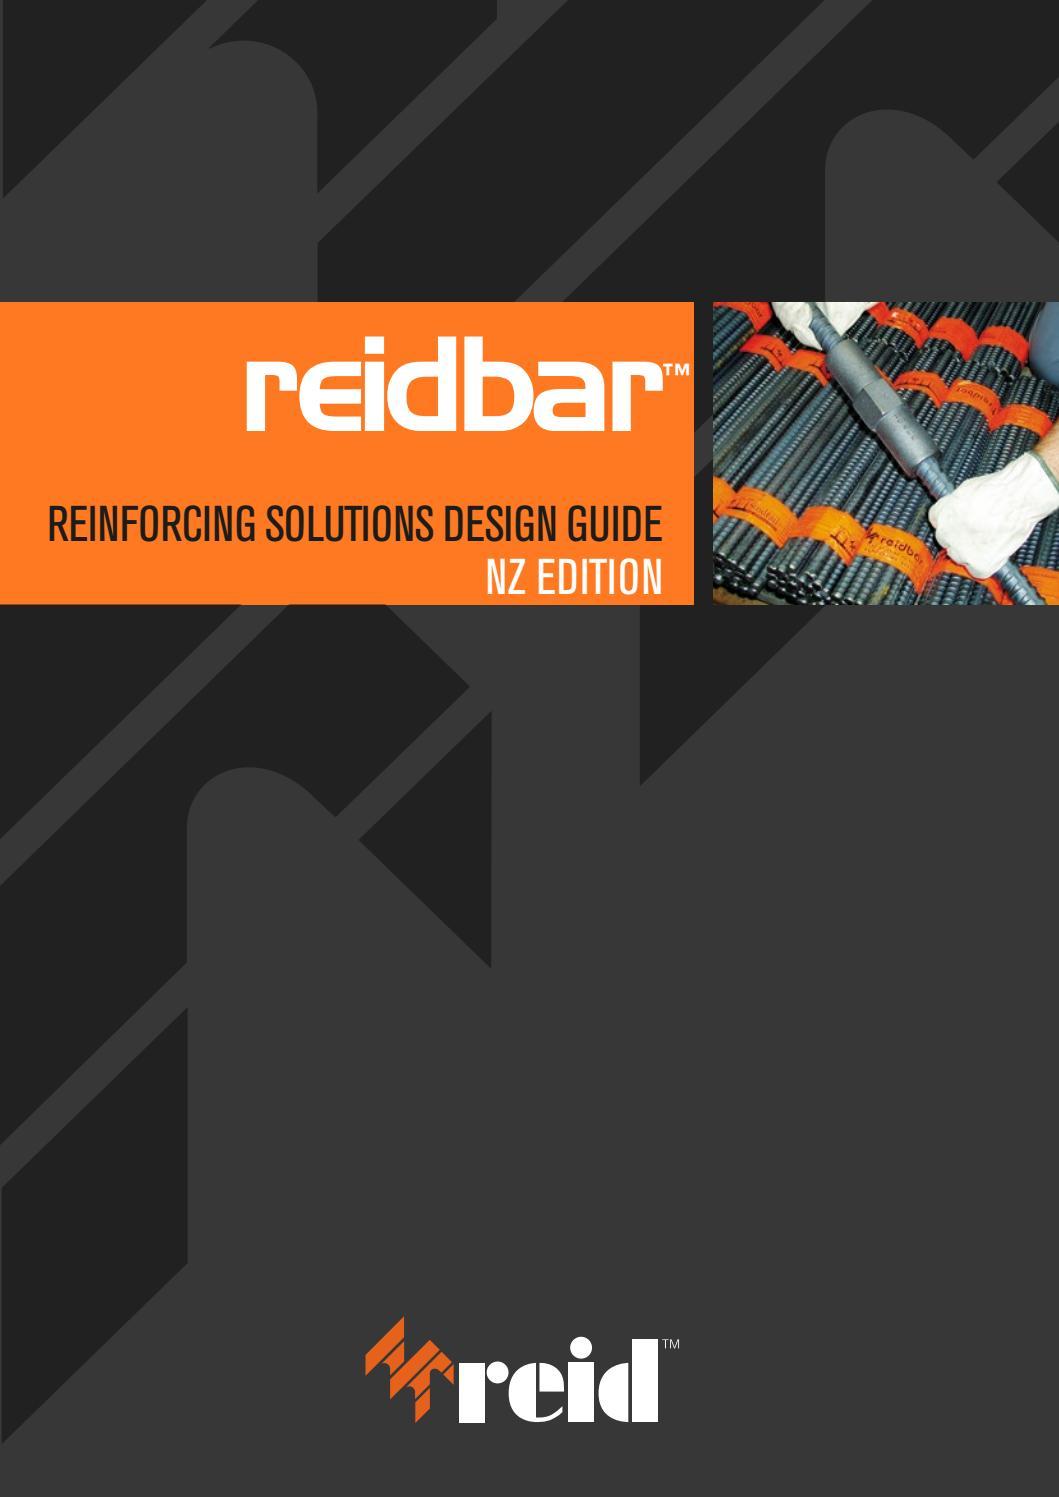 reidbar u2122 design guide by ramsetreid